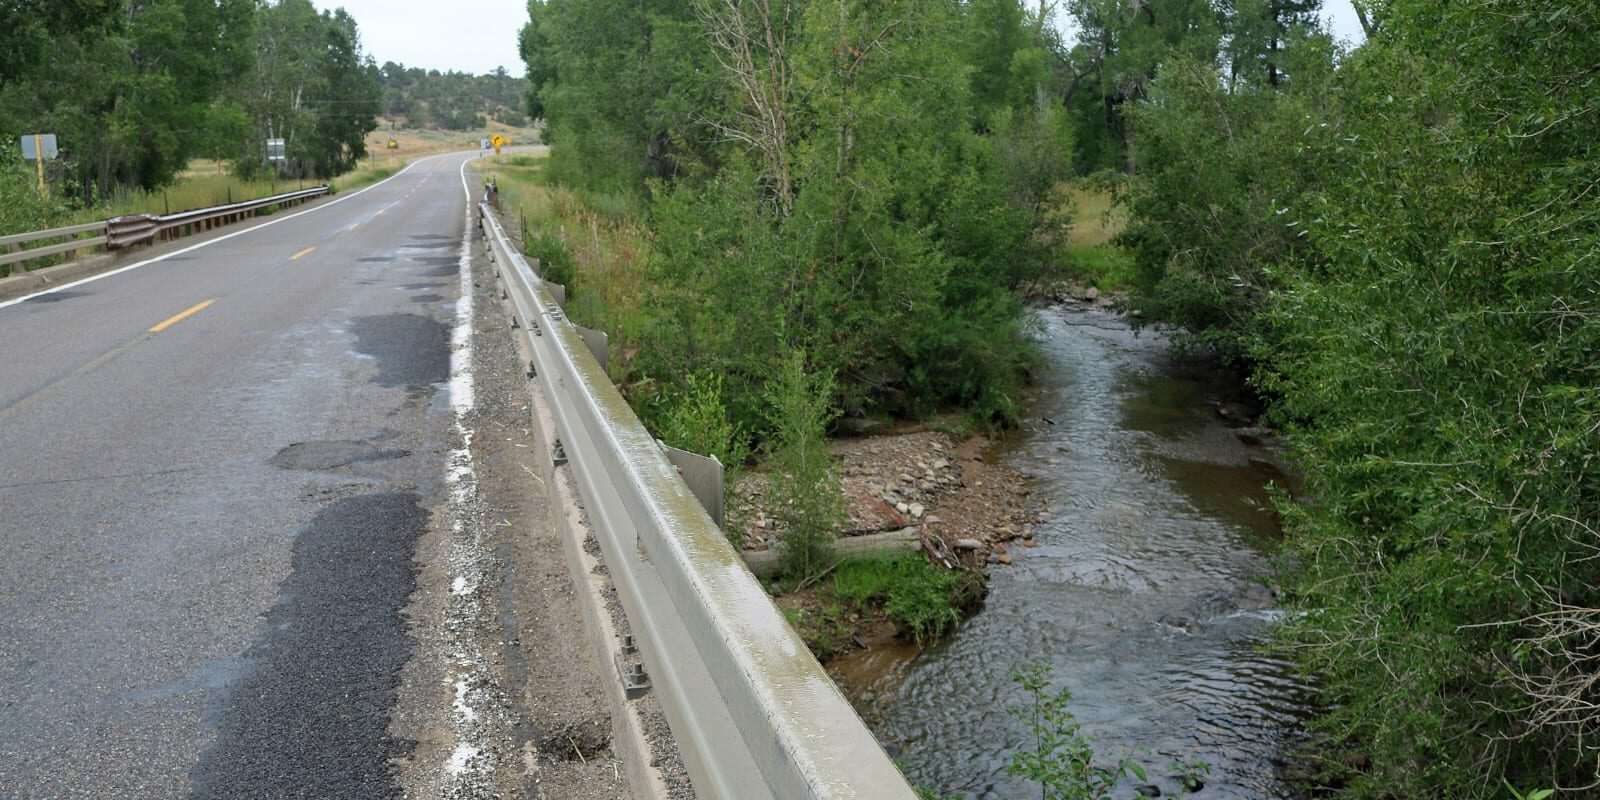 Image of the La Plata River at Highway 140 in Colorado